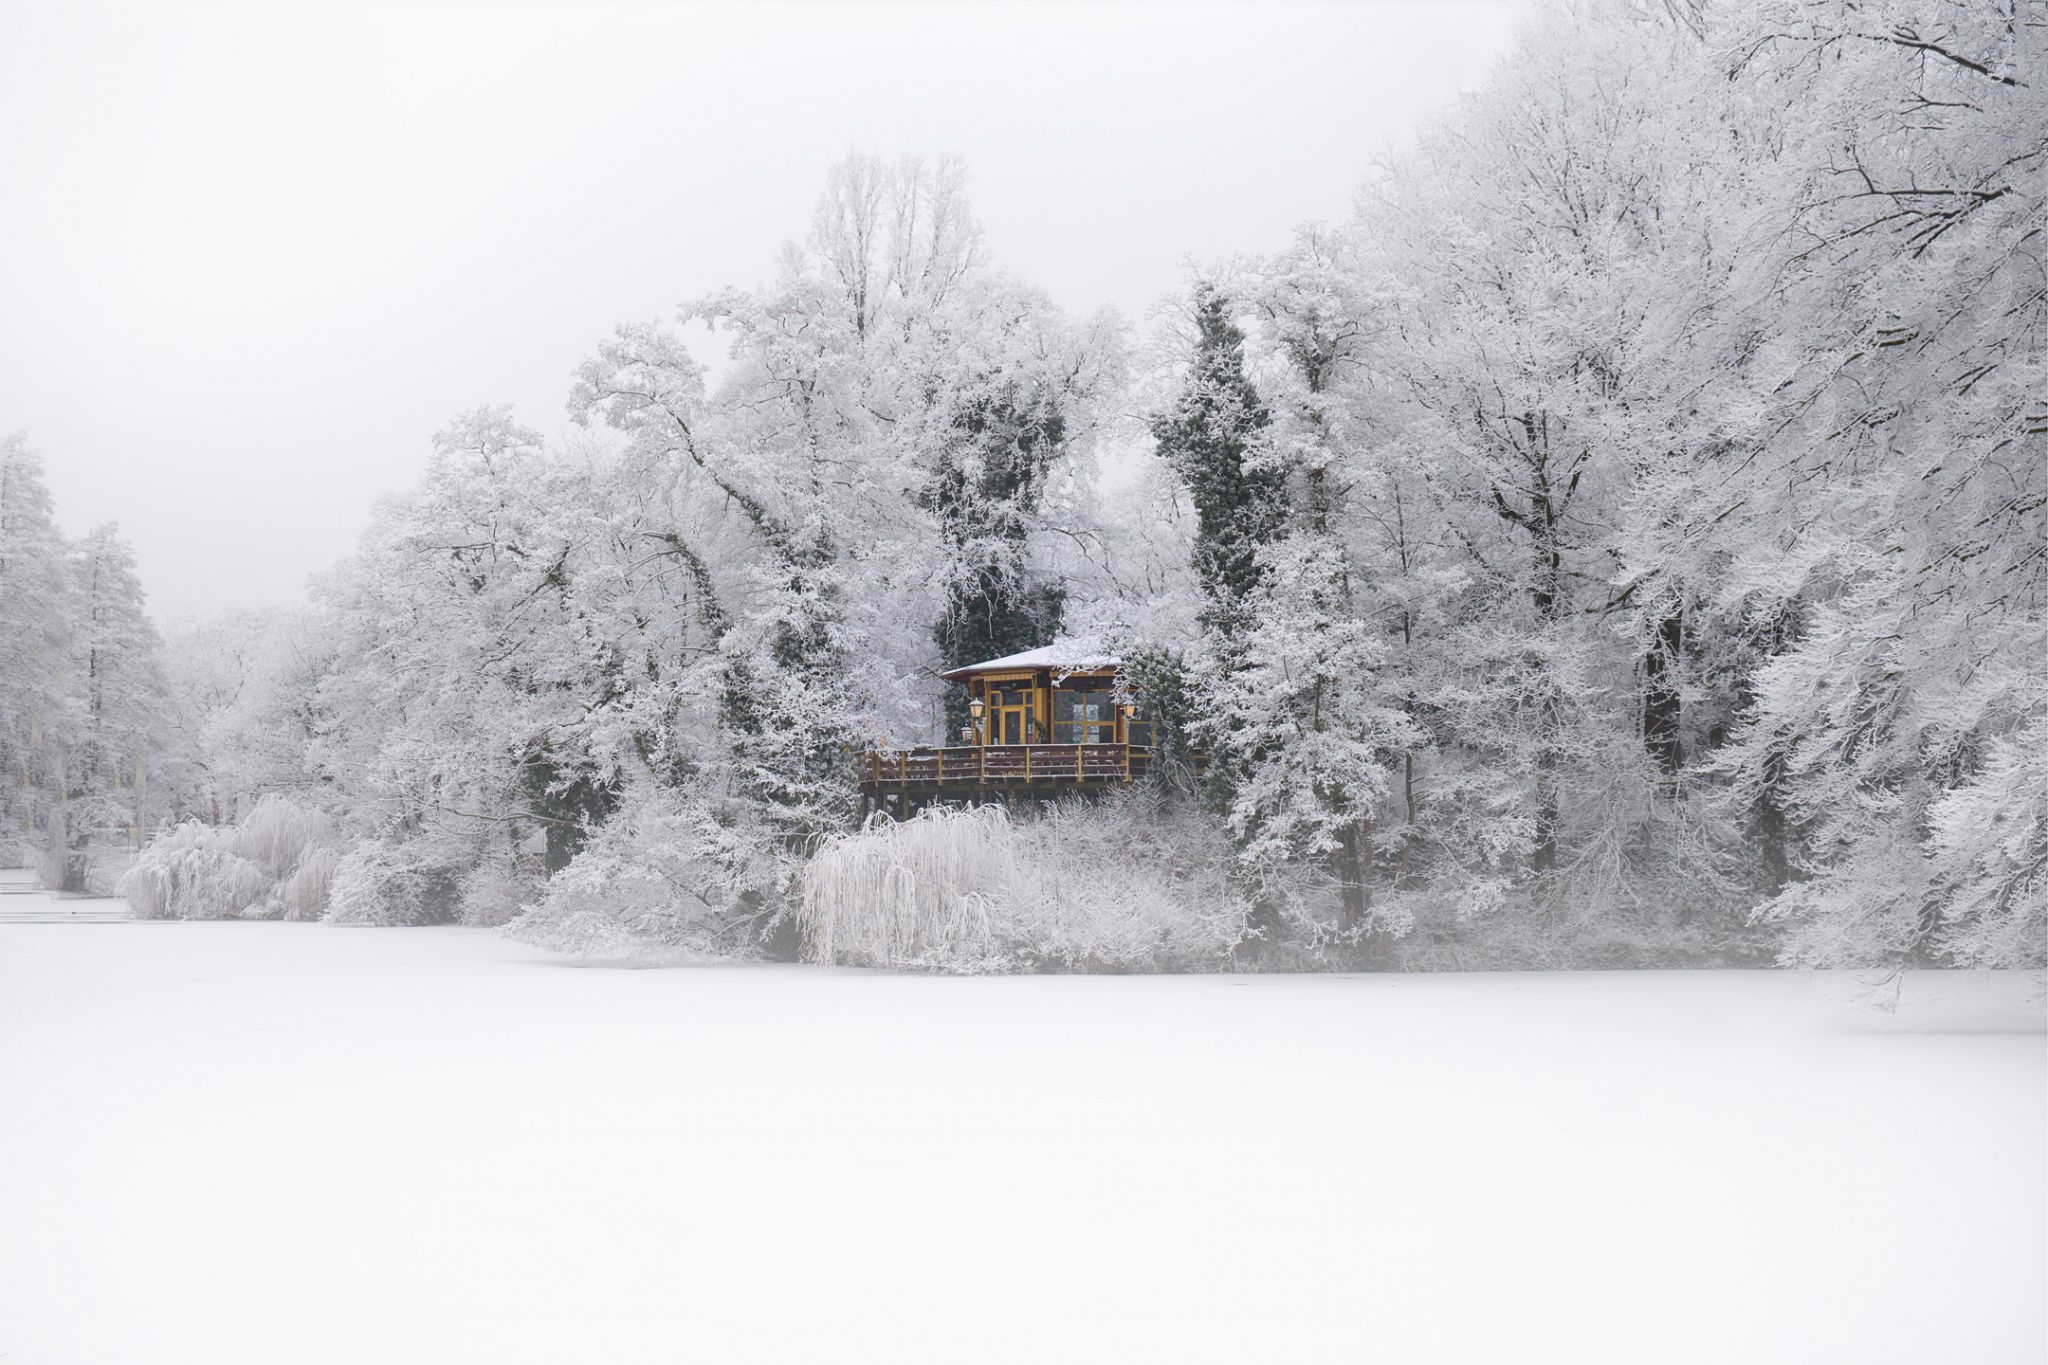 restaurant the pavilion on bird island during winter snow. Black Bedroom Furniture Sets. Home Design Ideas